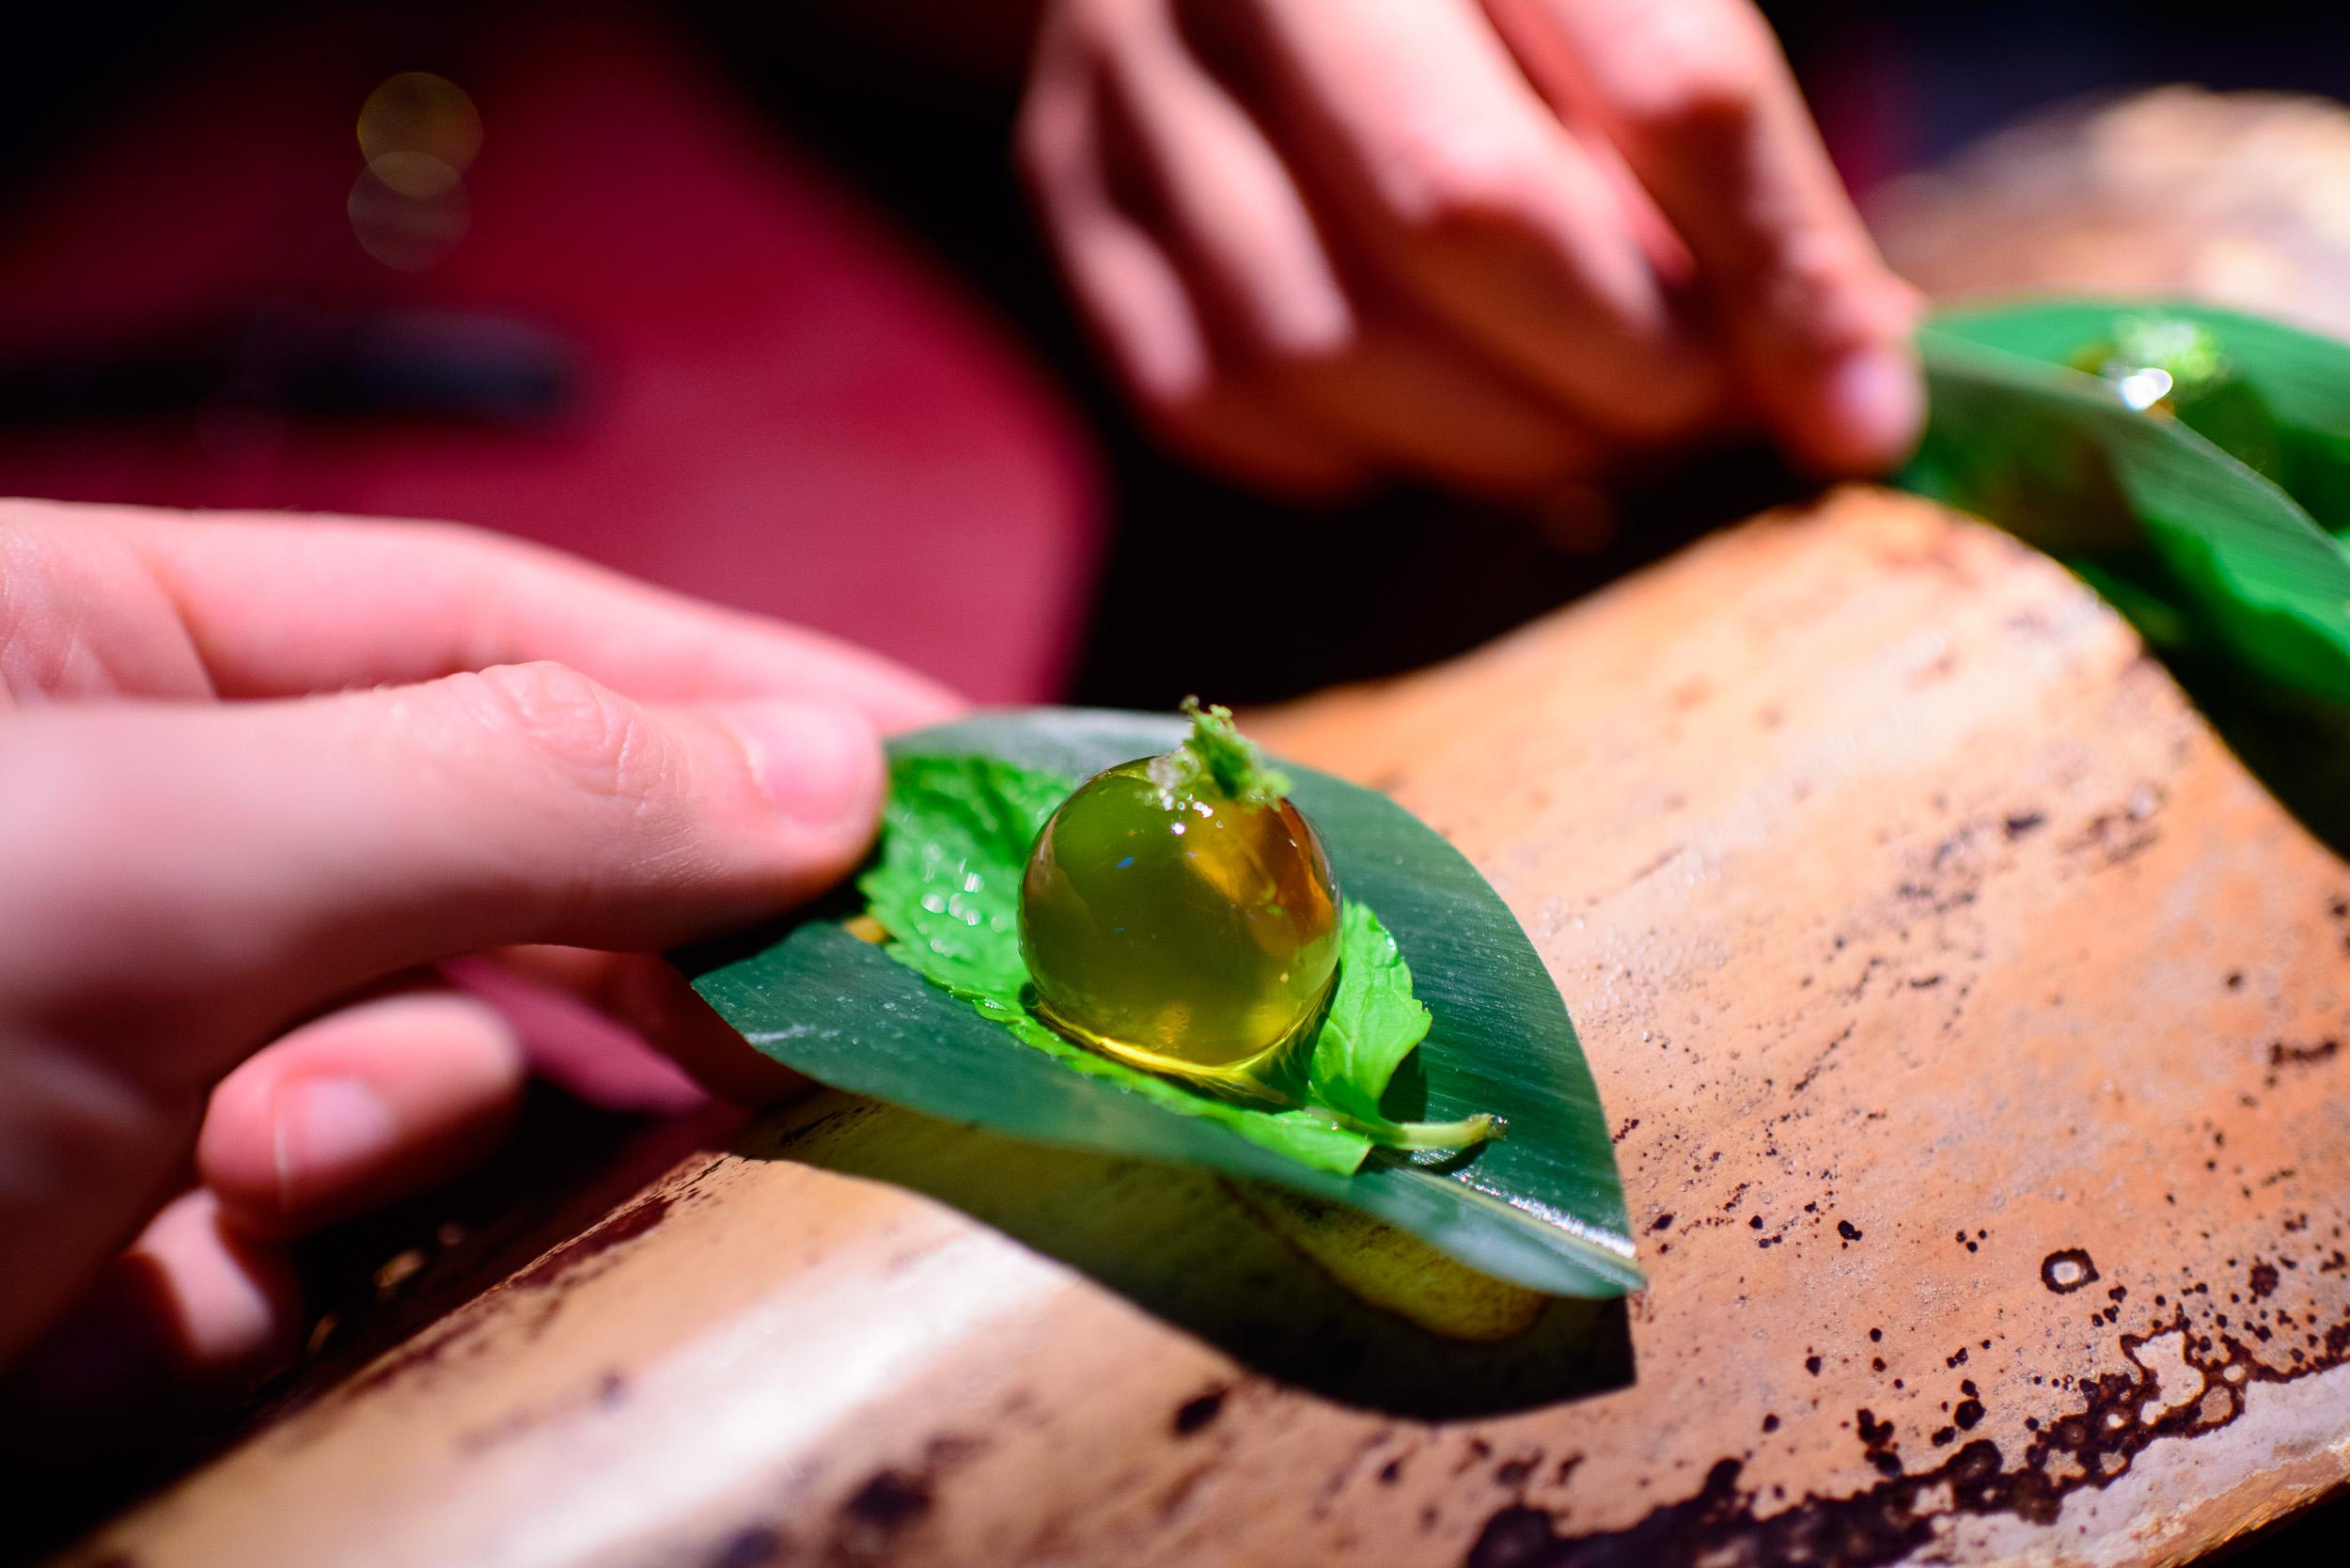 Ambar de miel de agave, tequila, y lima, up close